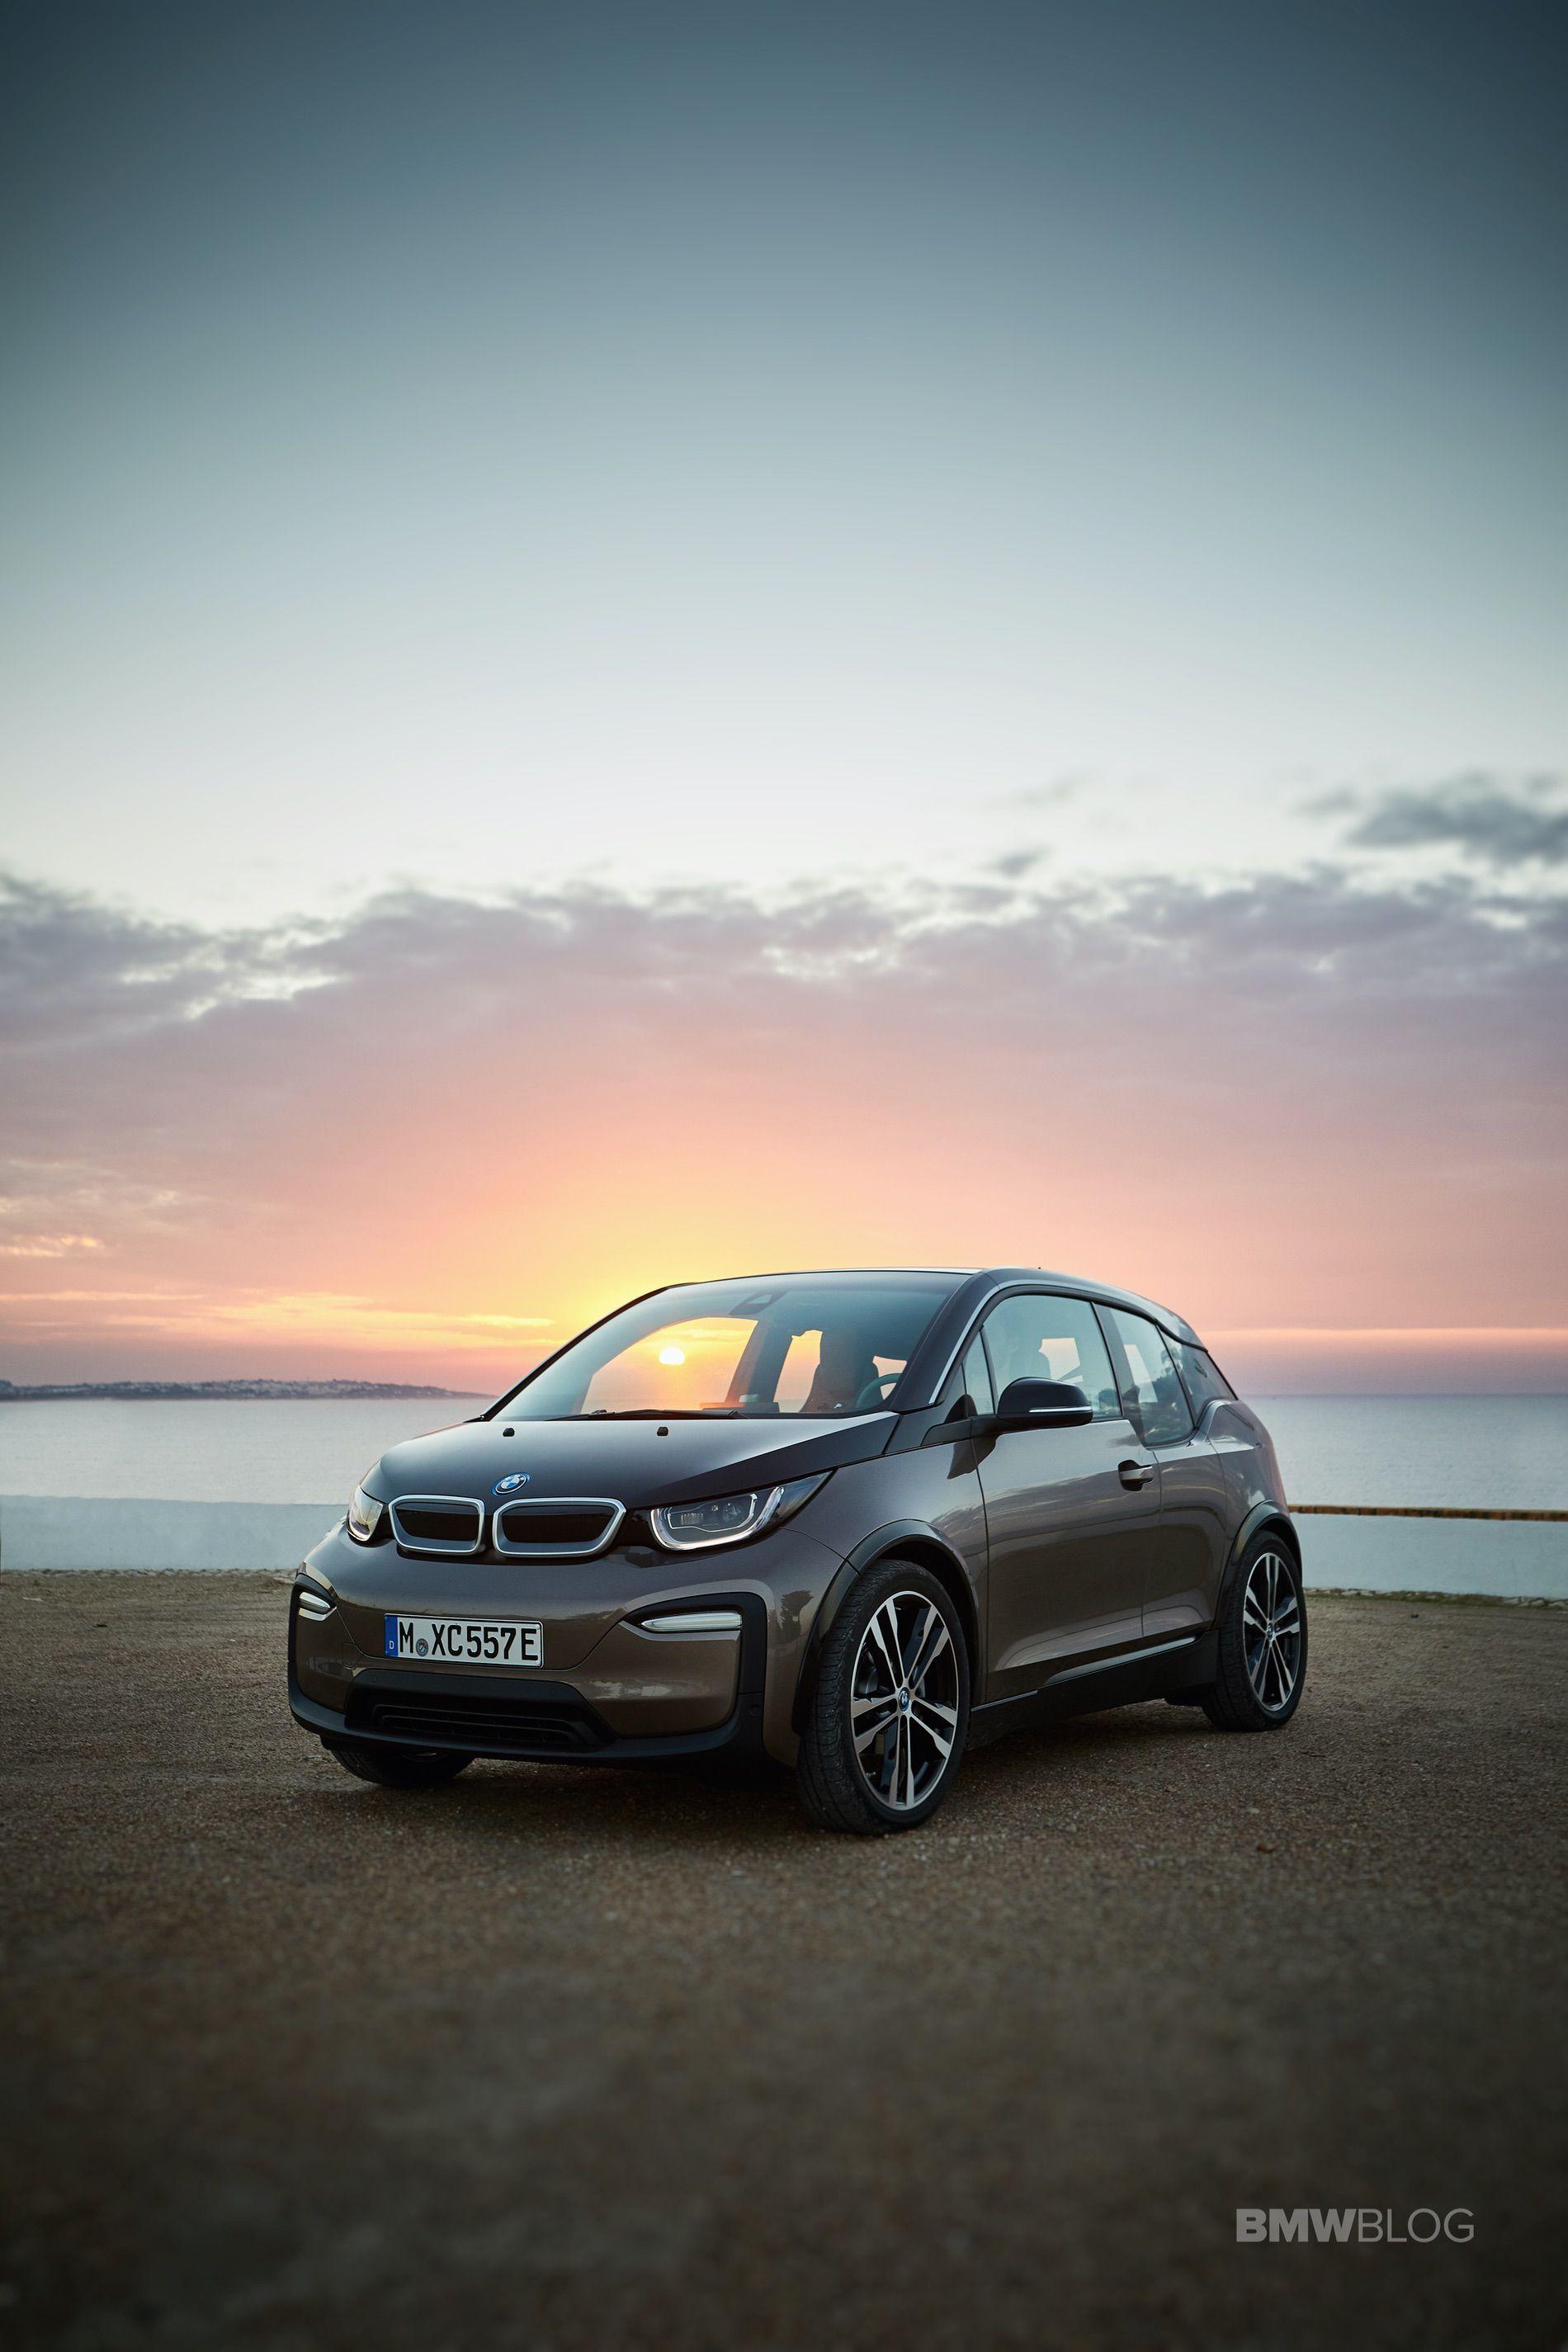 BMW i3 Jucaro Beige Metallic 18